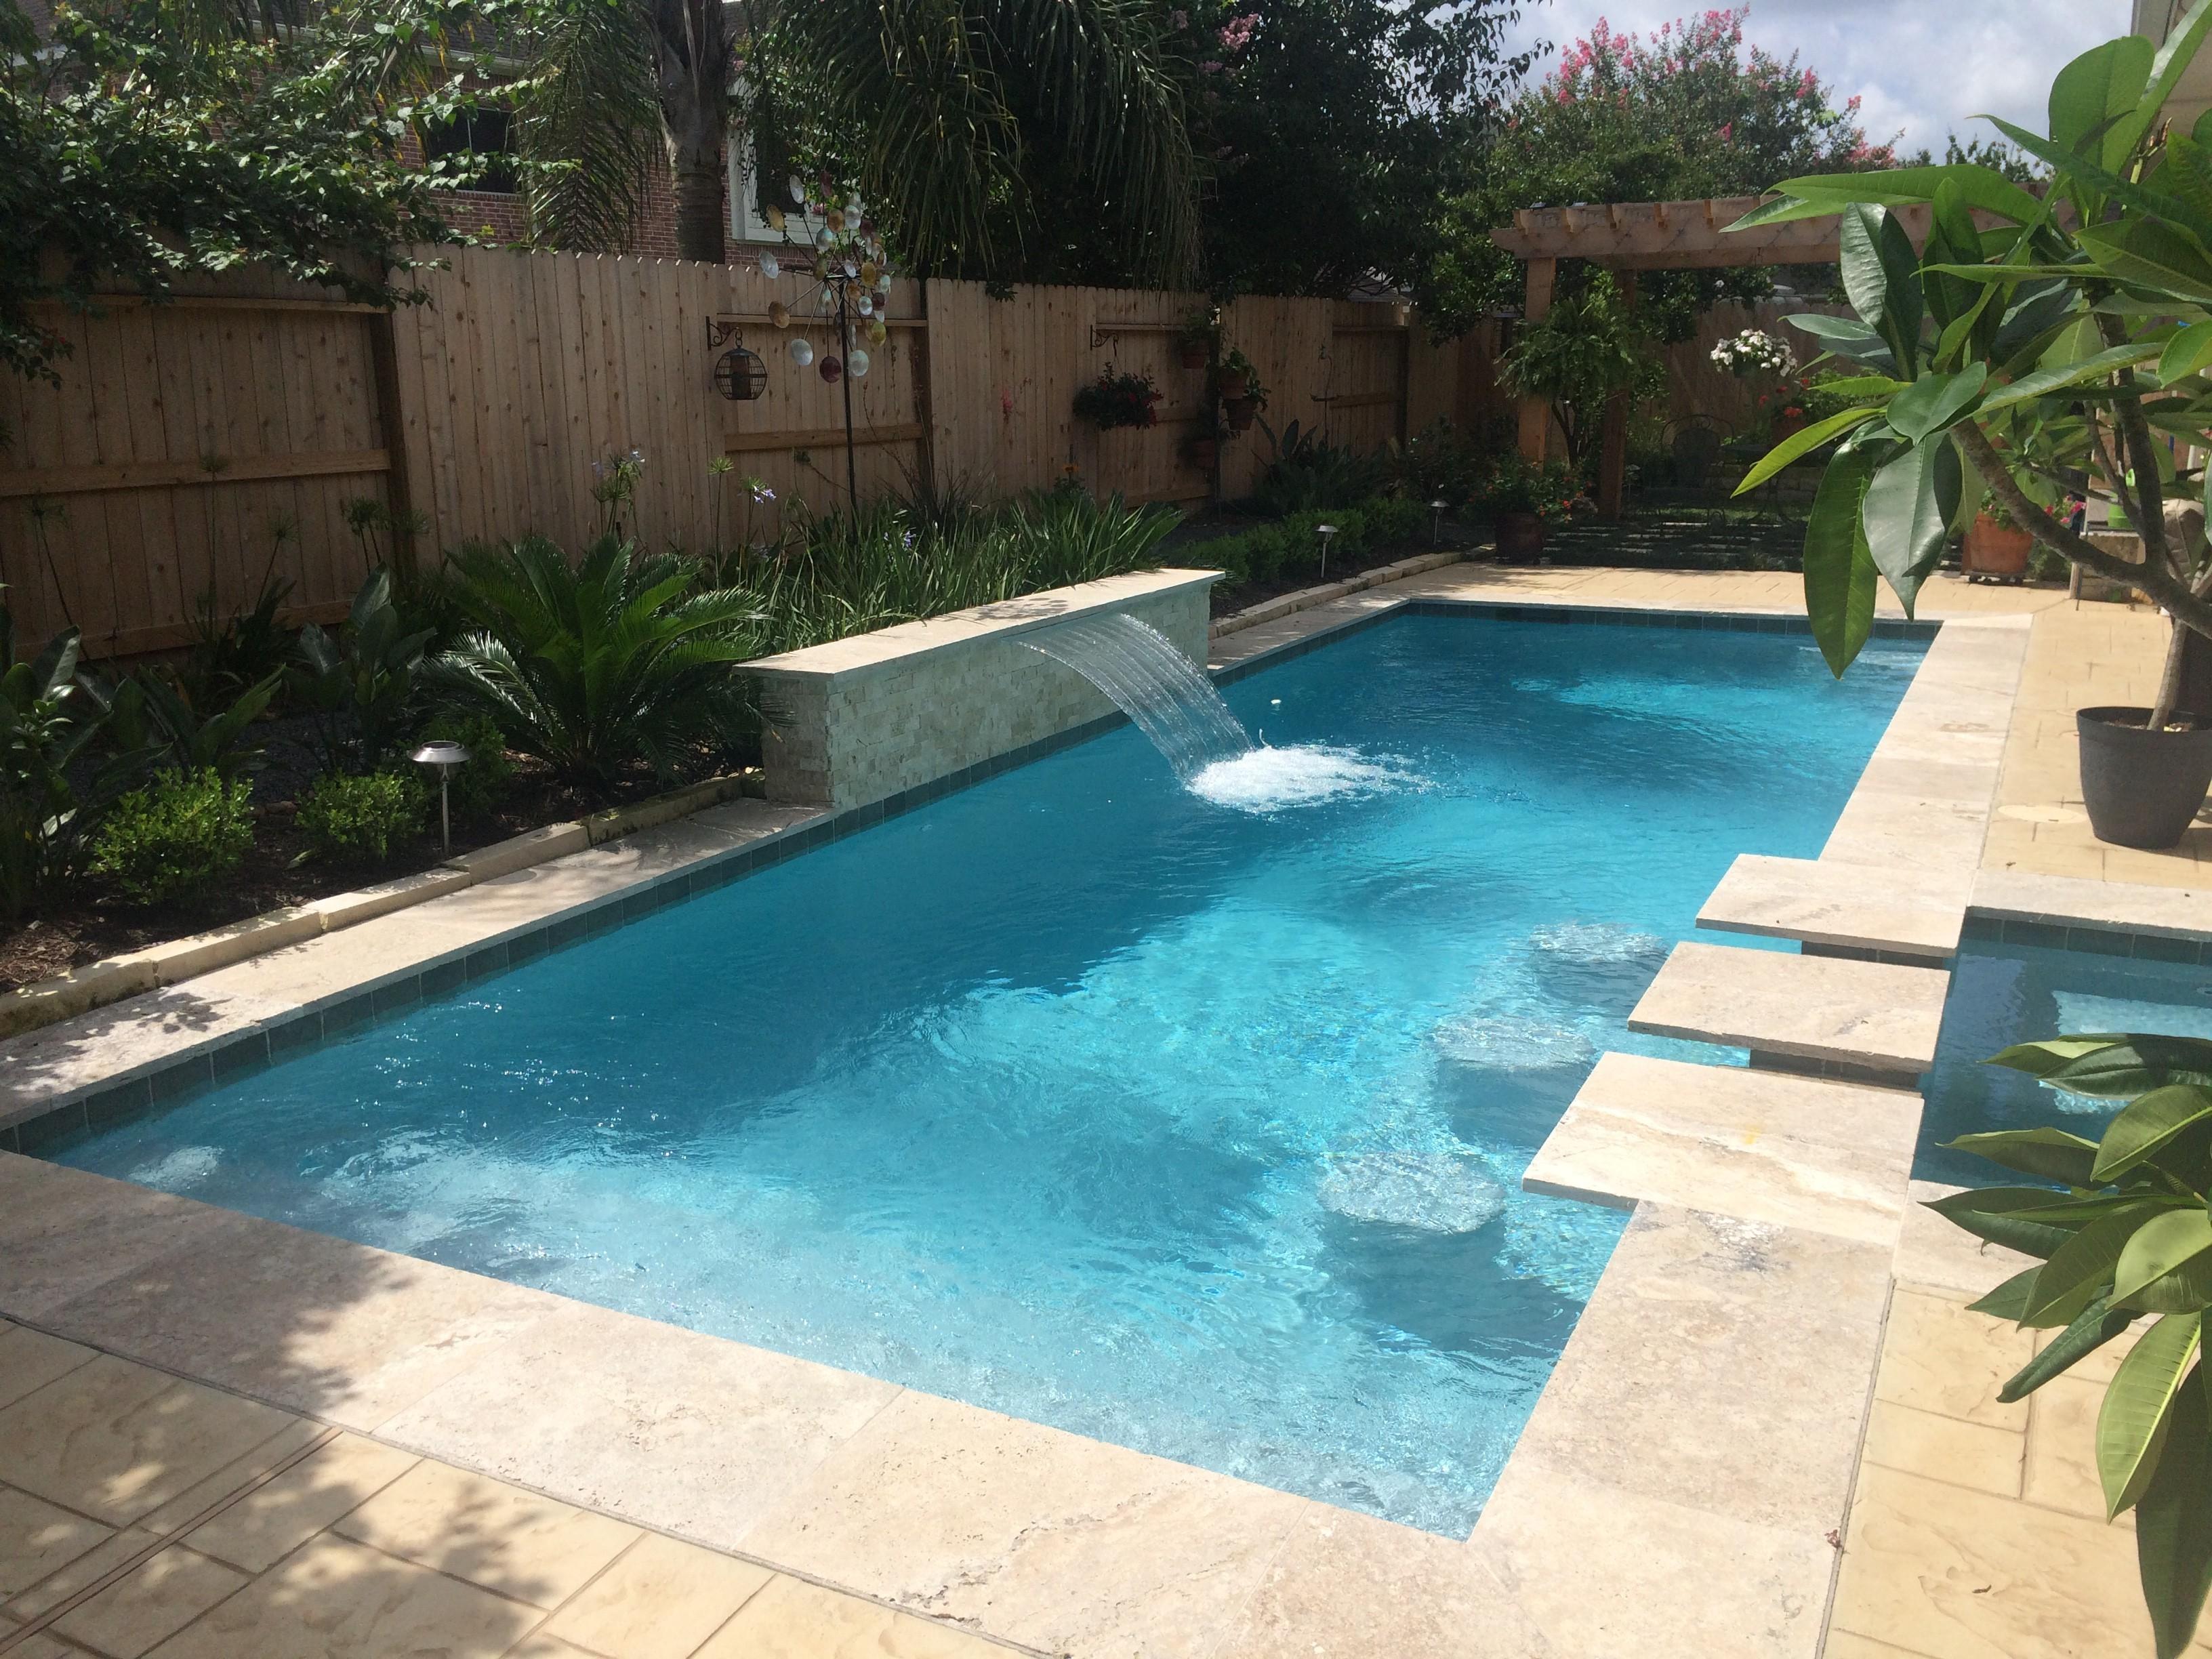 Katy Pool Designs Cypress Spring Tomball